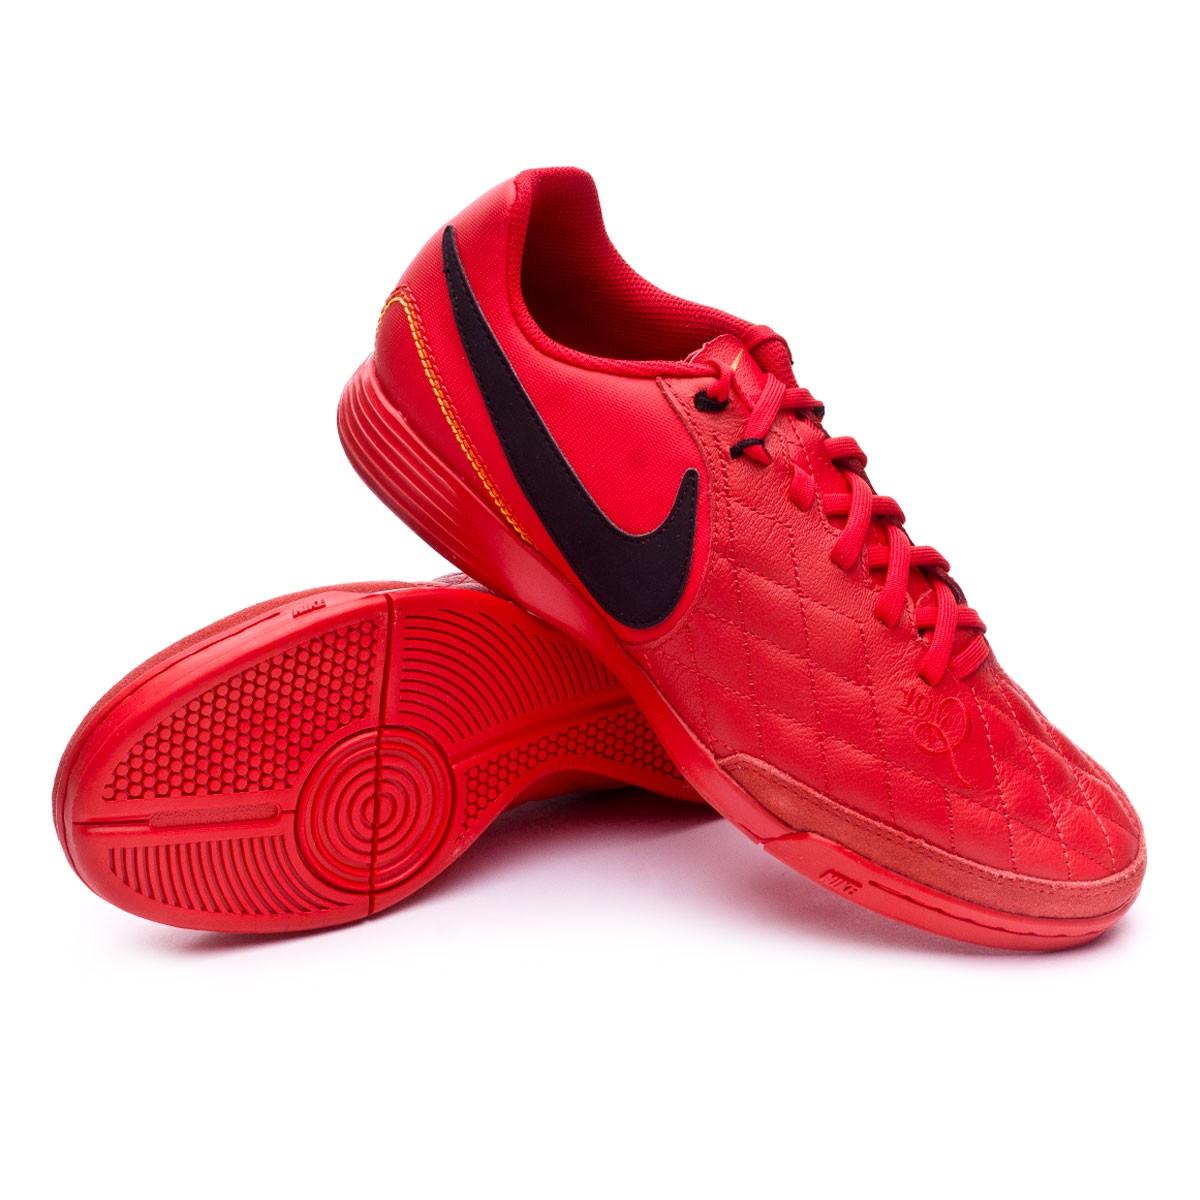 dee38e60d71 Futsal Boot Nike LegendX VII Academy 10R IC University red-Black ...